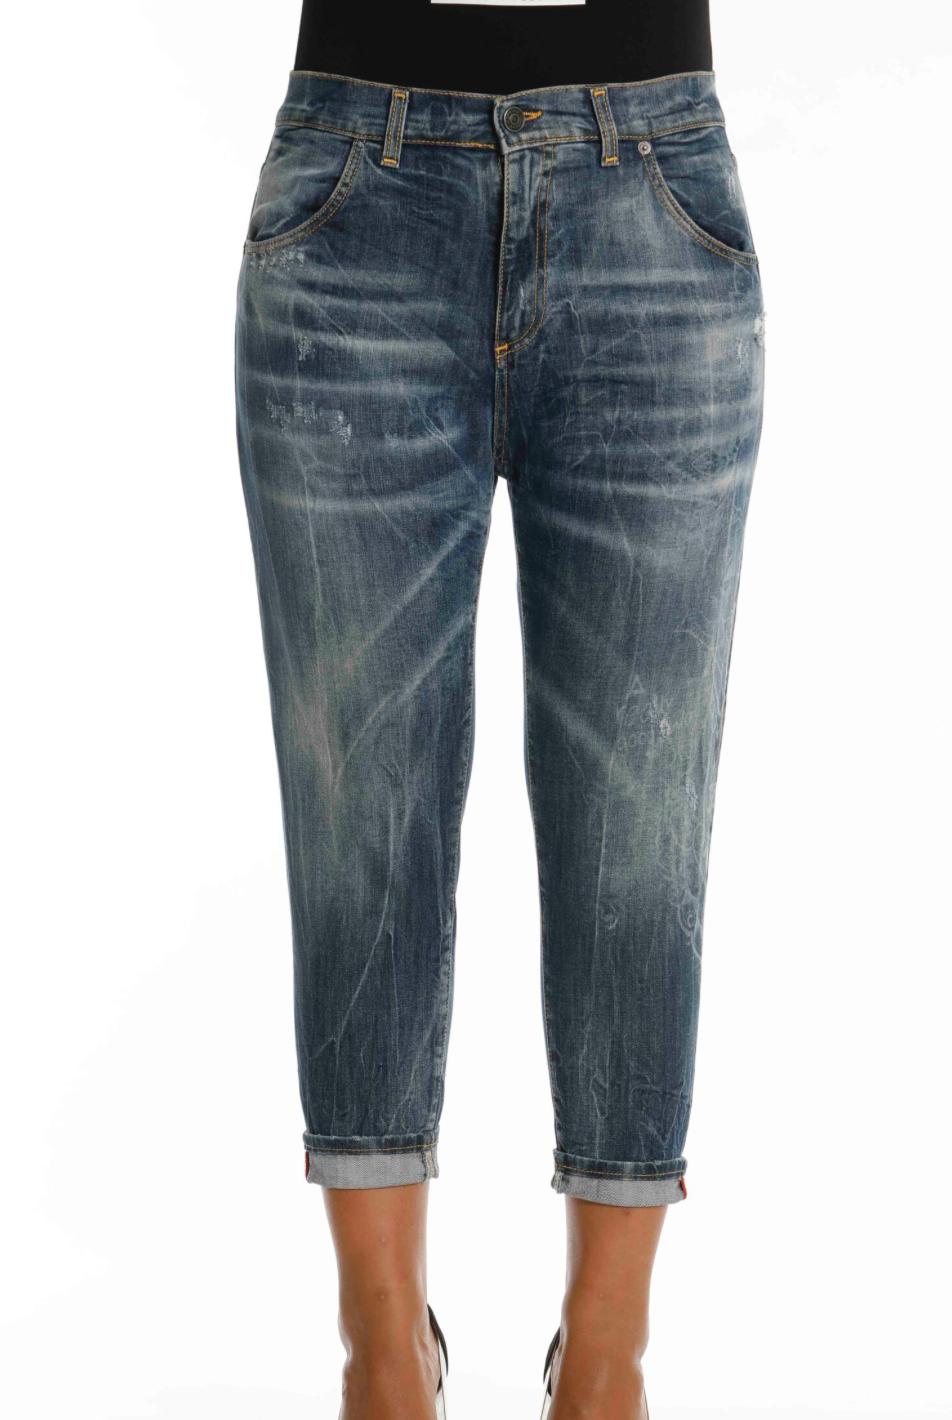 Jeans Boyfriend Patriòt PATRIOT   Jeans   PJ1190DENIM